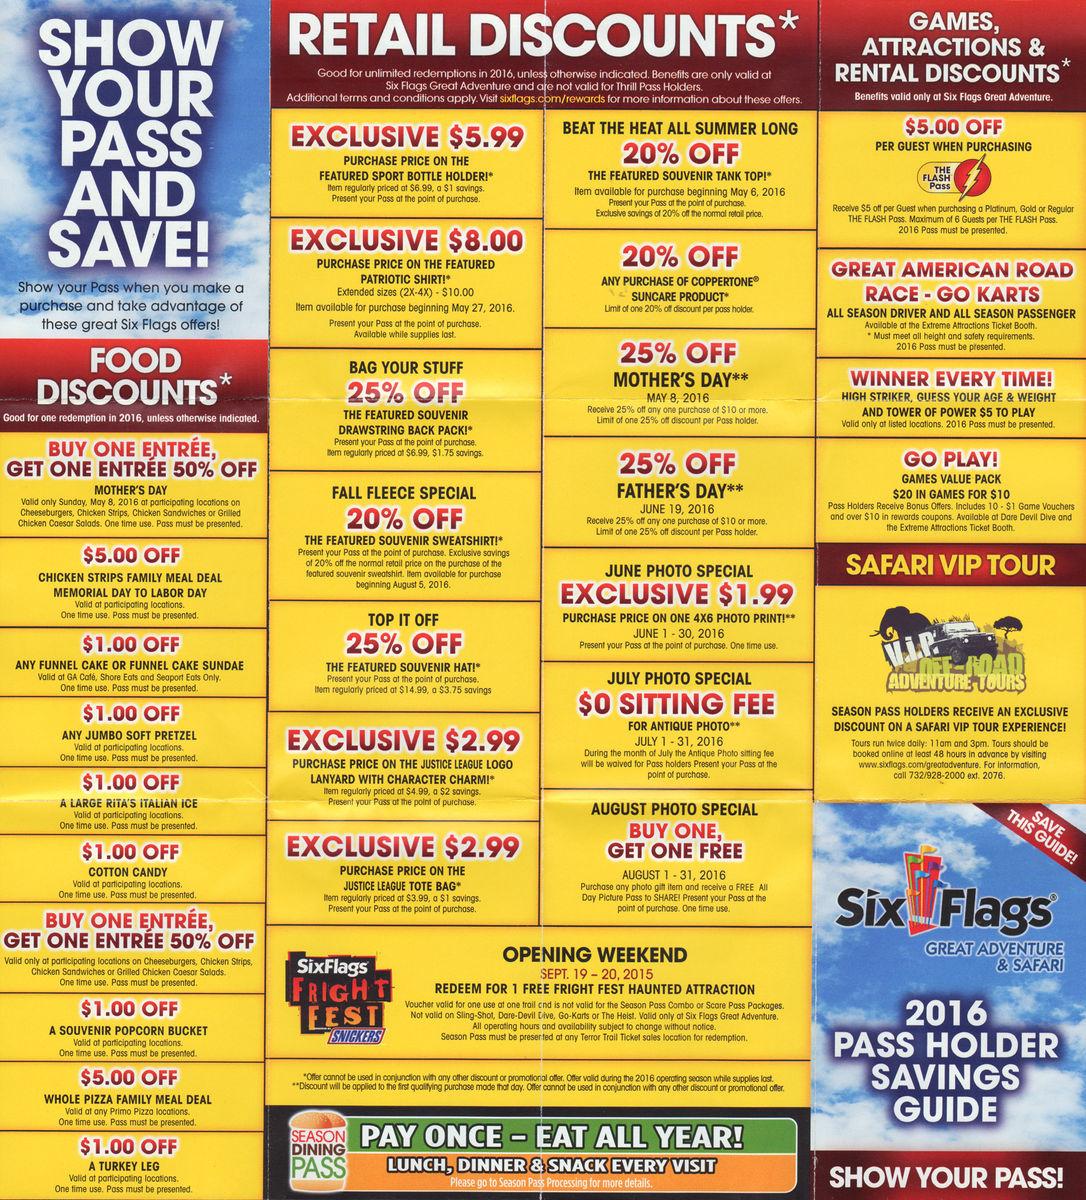 Six Flags Fiesta Texas Crowd Calendar 2017 – About Flag Pertaining To Six Flags Over Georgia Calendar